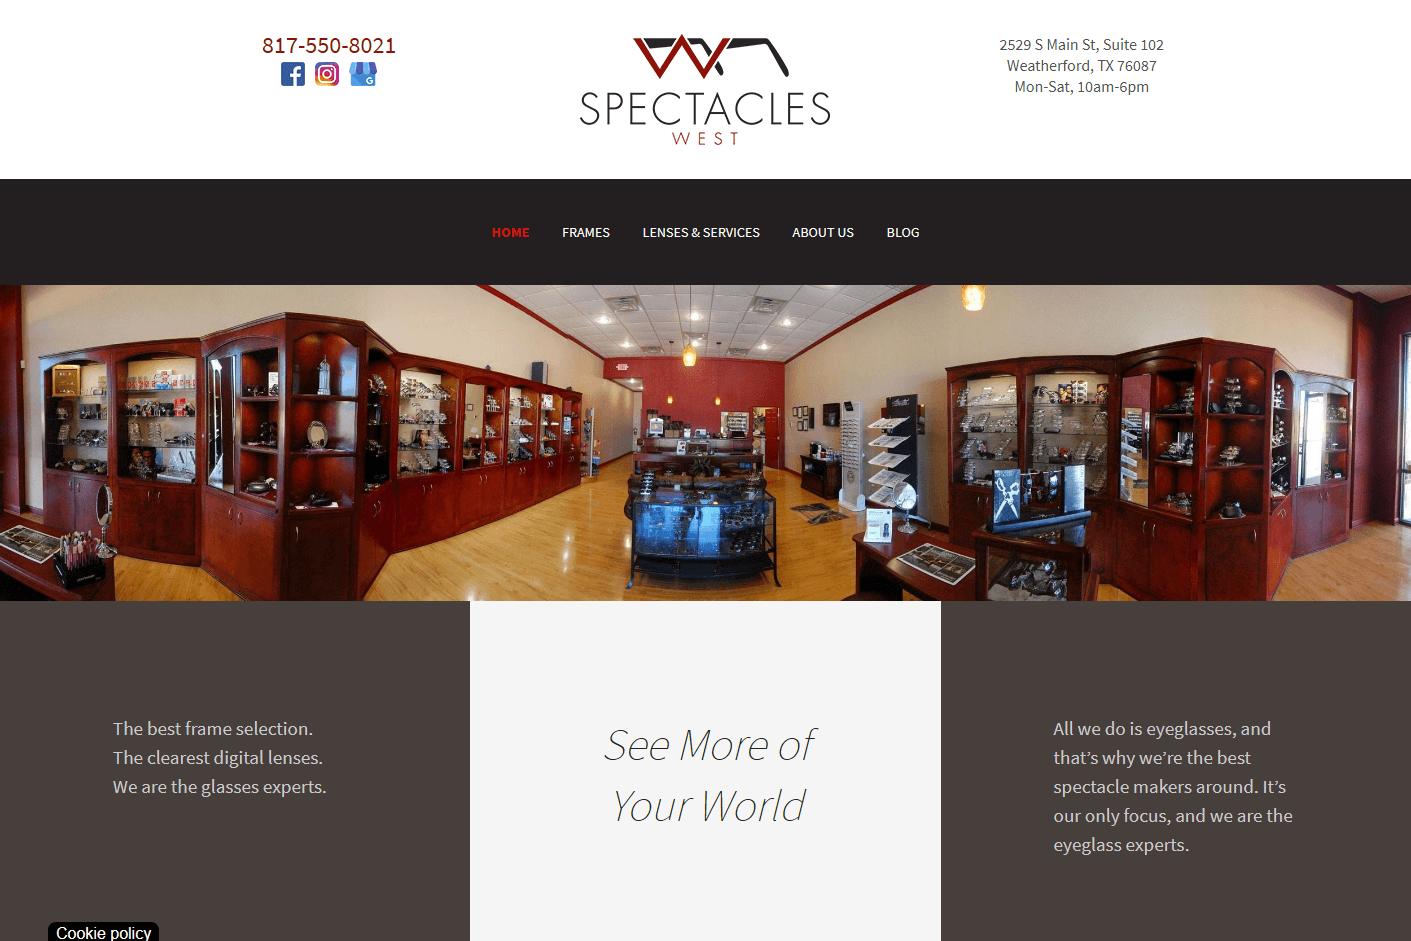 Spectacles West Website